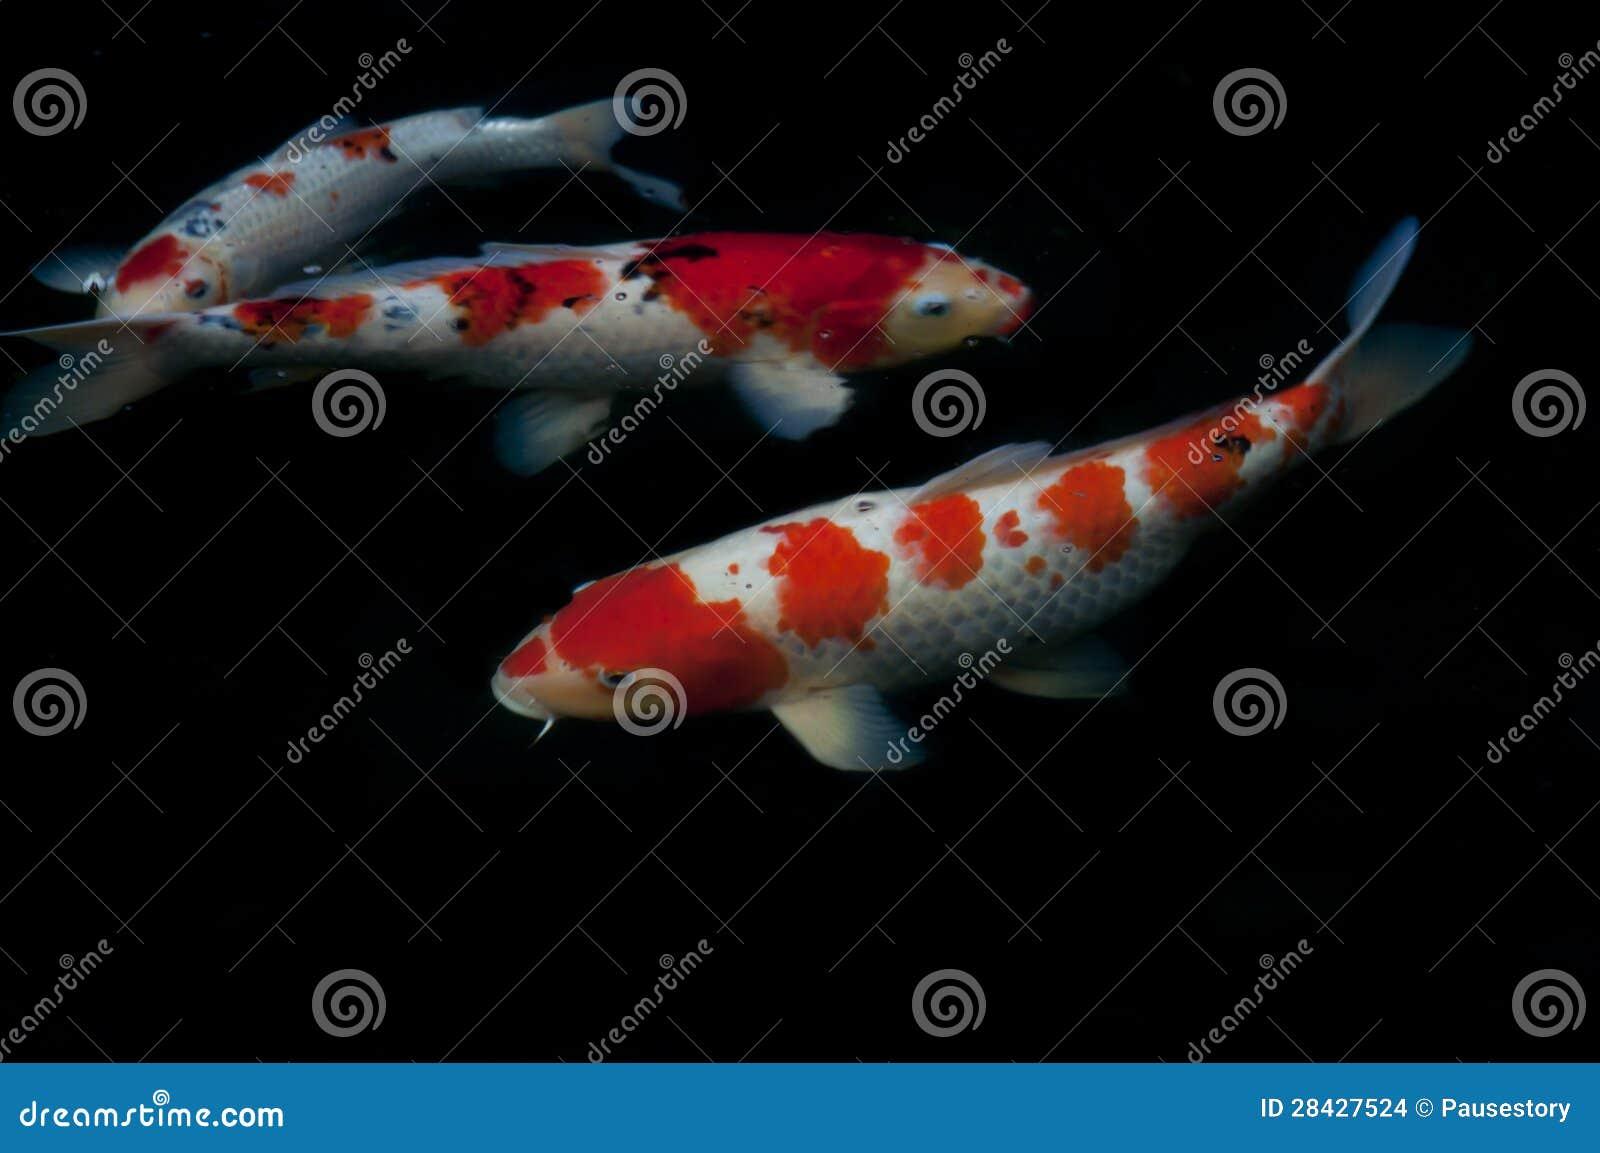 Koi fish royalty free stock image for Koi fish dealers